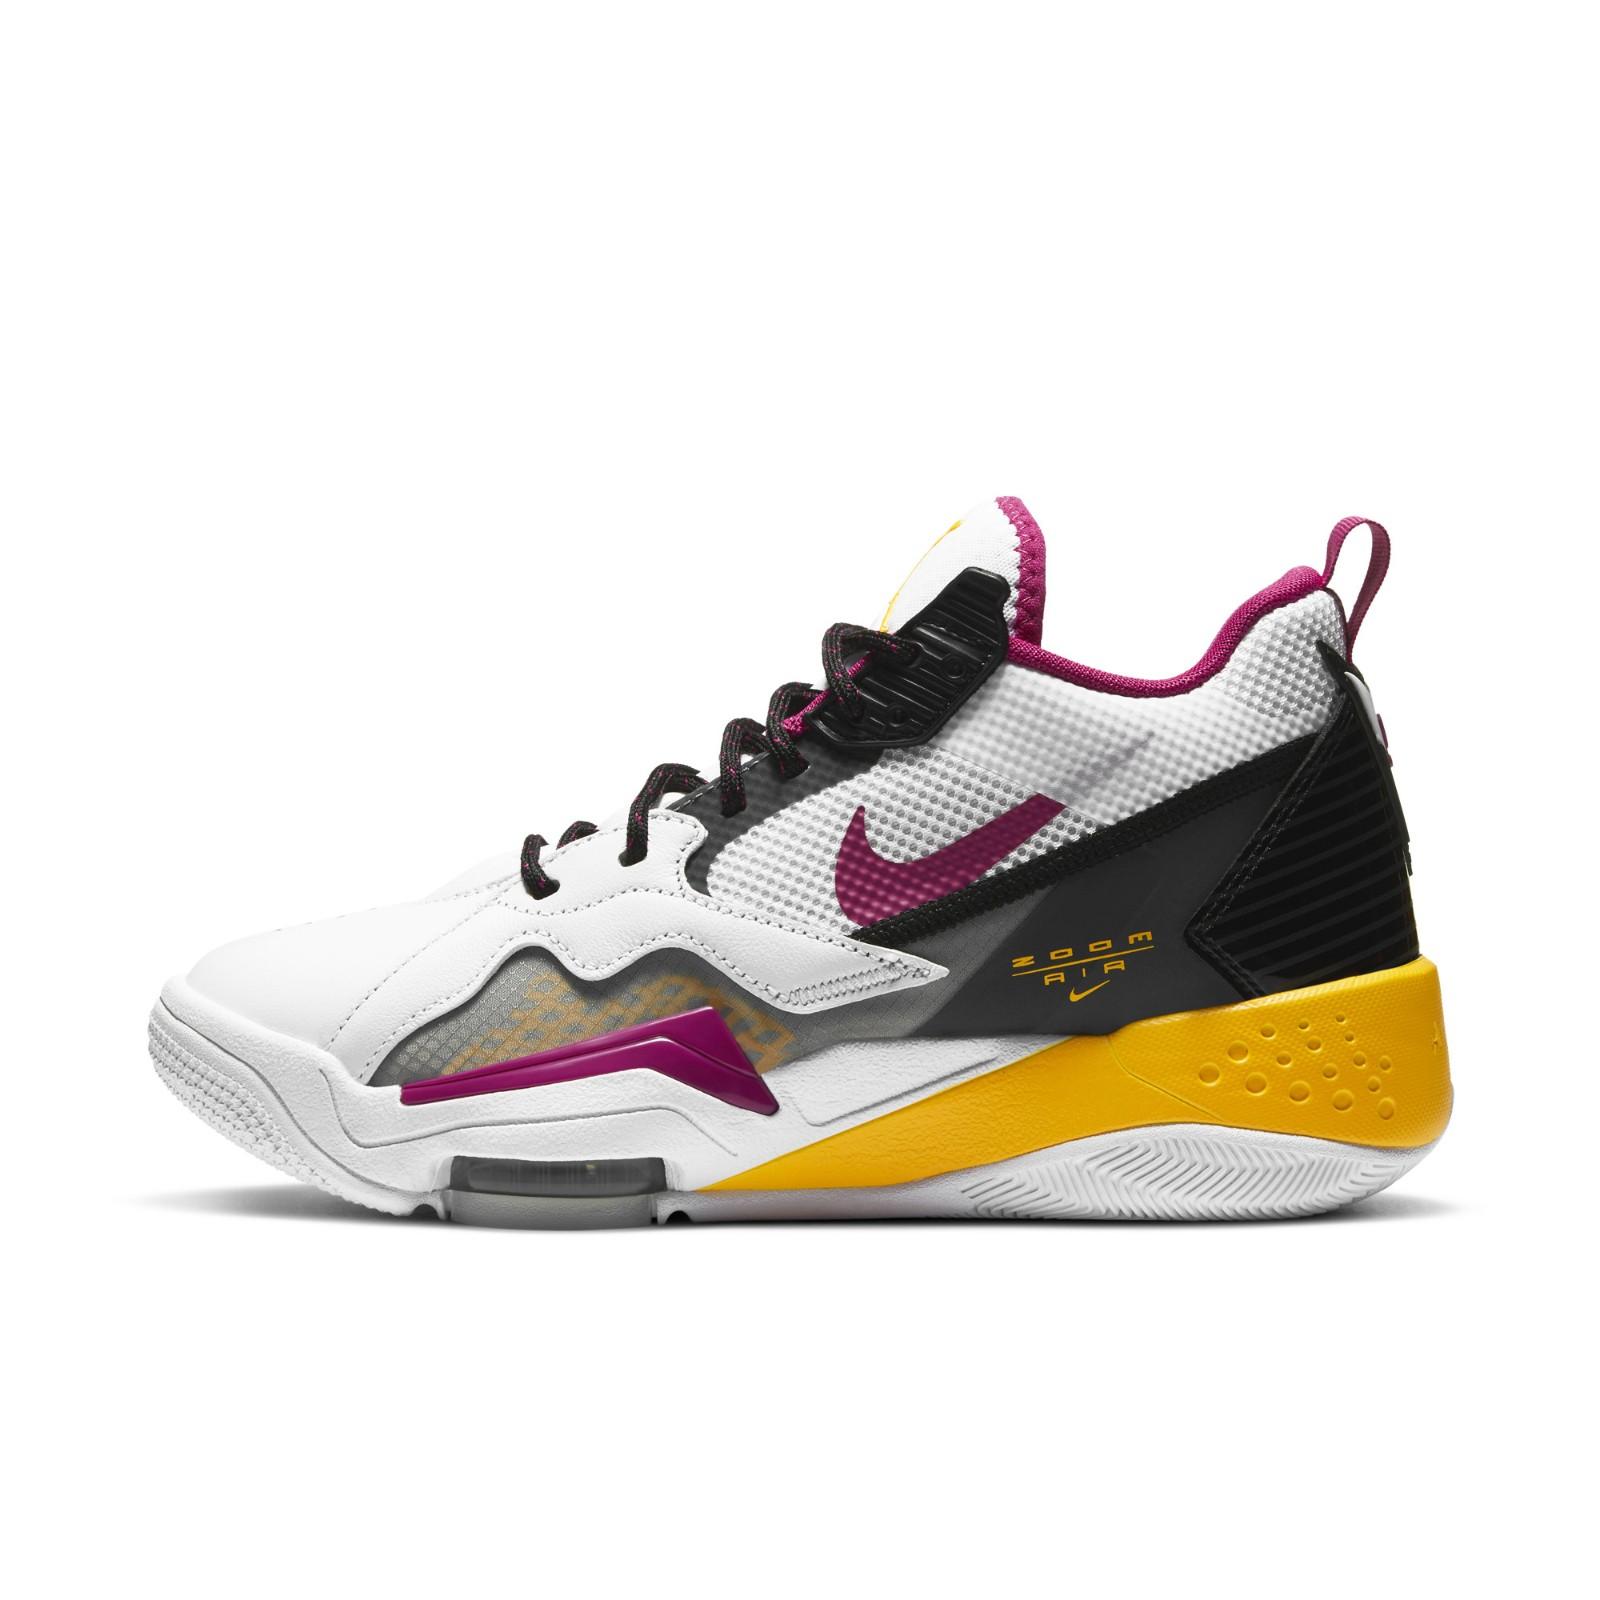 AIR JORDAN Zoom 92 女士篮球鞋 CK9184-105 白色/仙人掌花红/黑/烟灰/激光橙 38